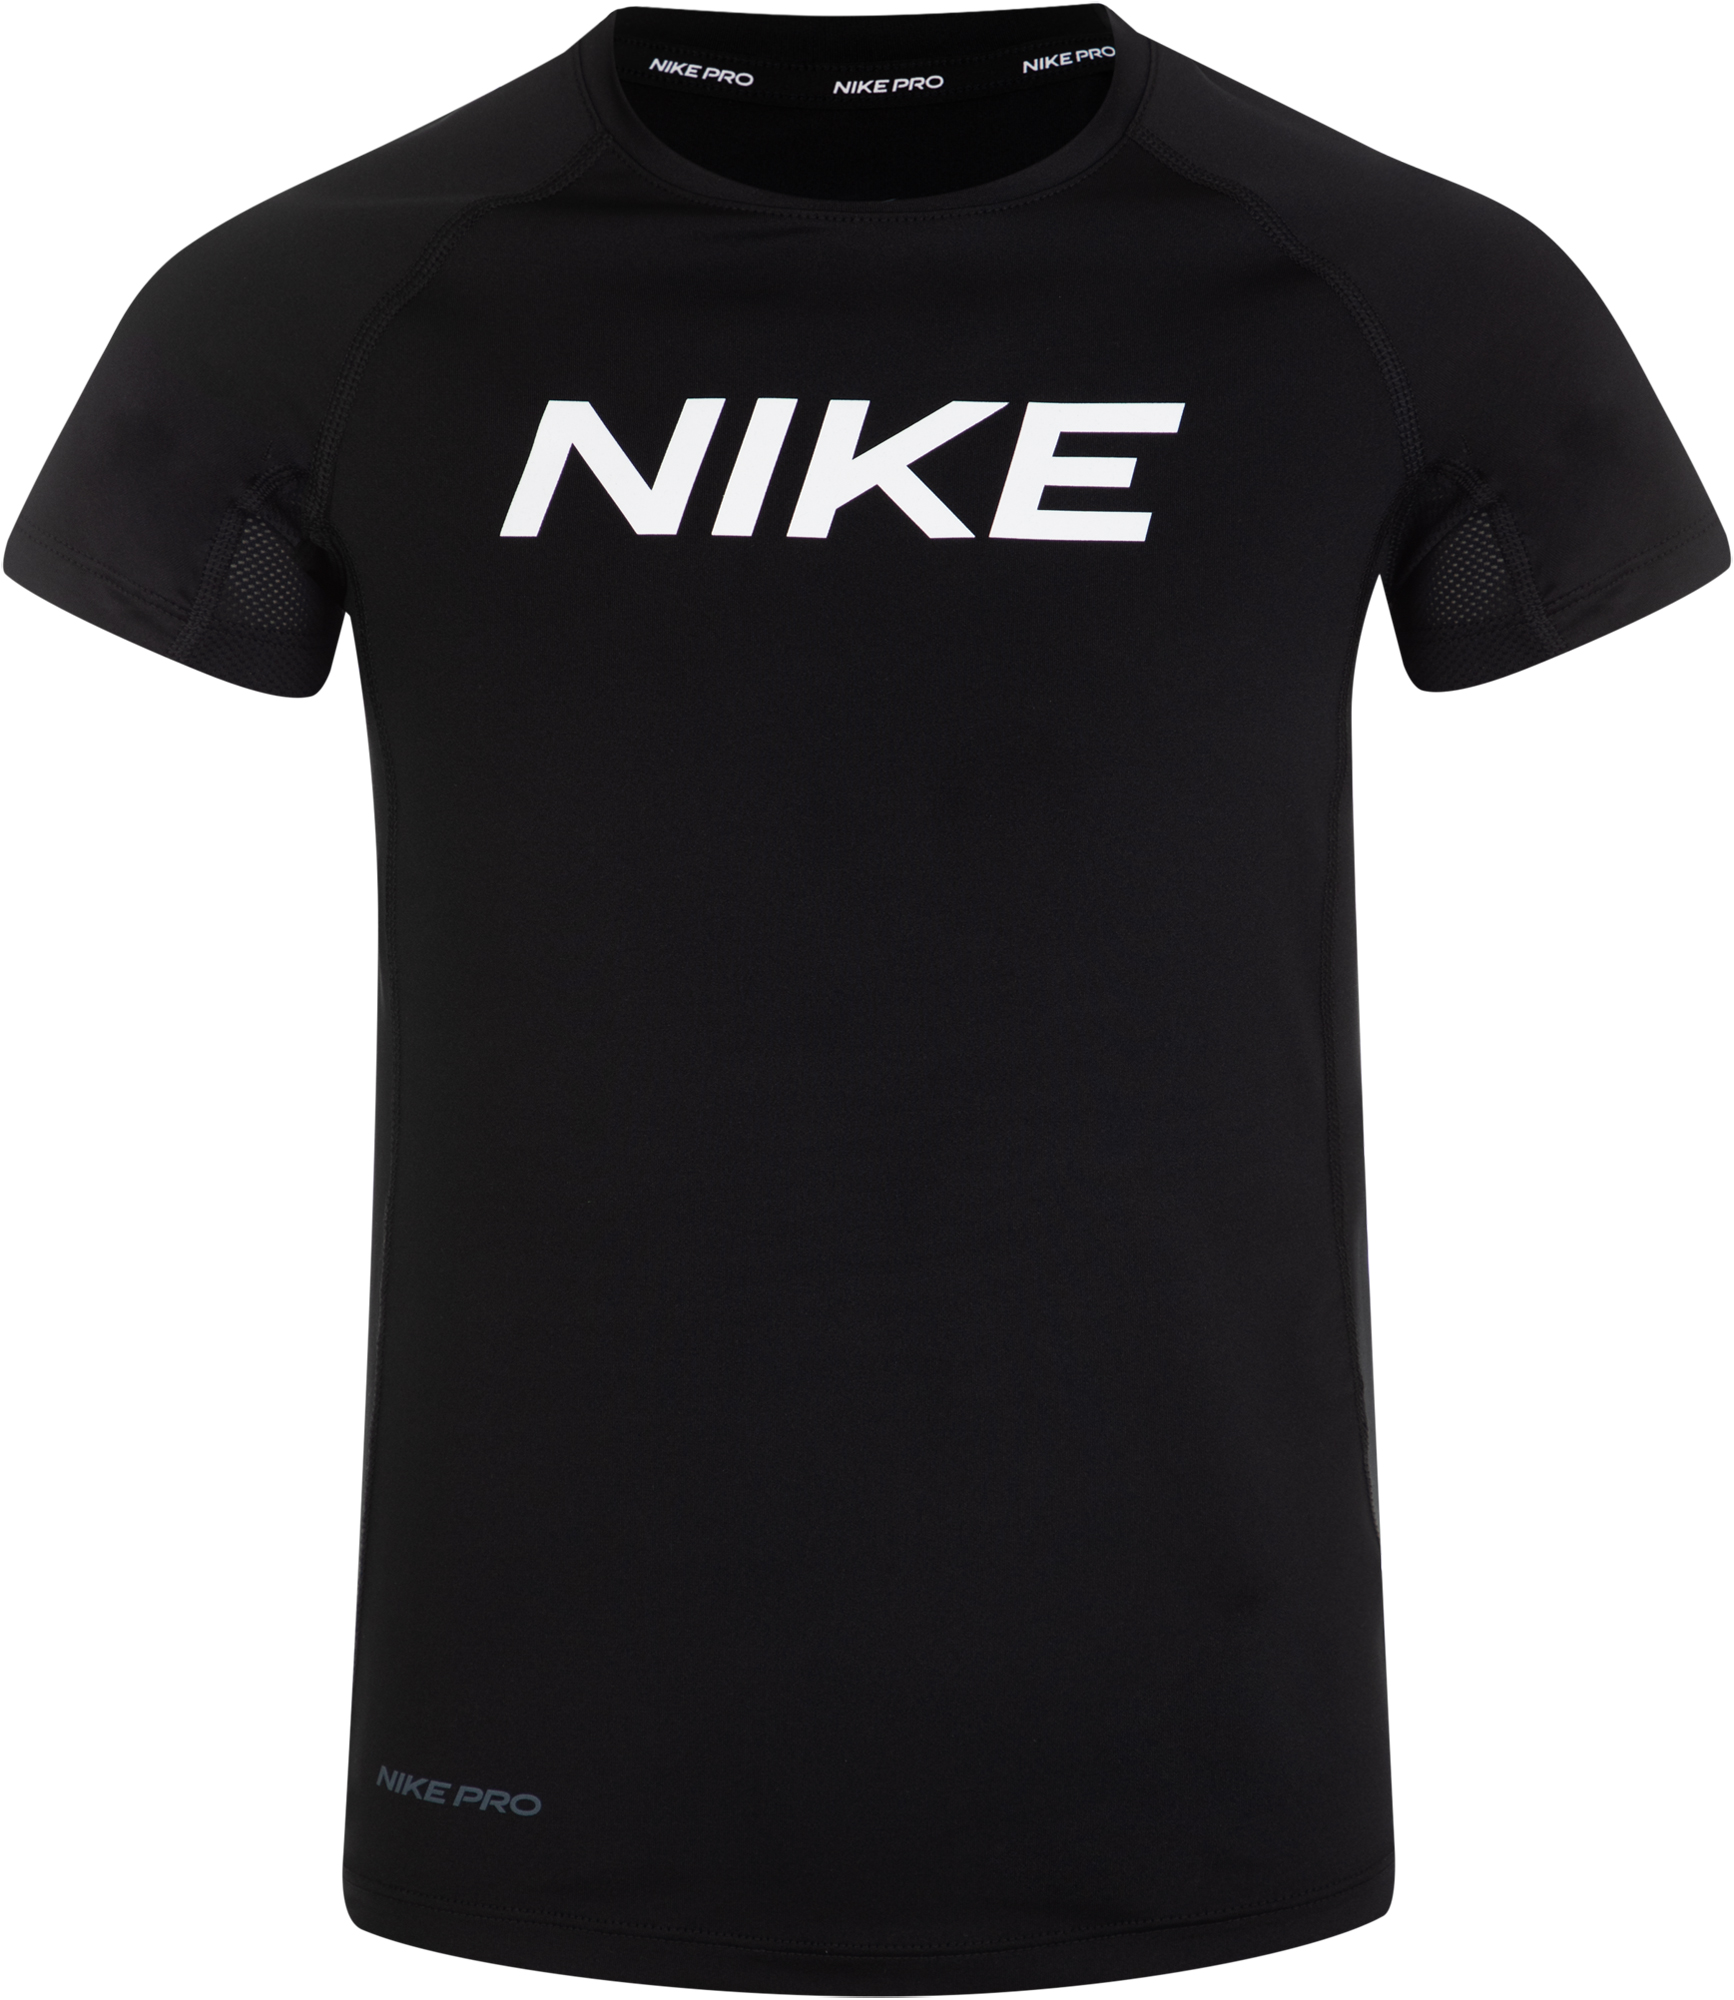 Nike Футболка для мальчиков Nike Pro, размер 147-158